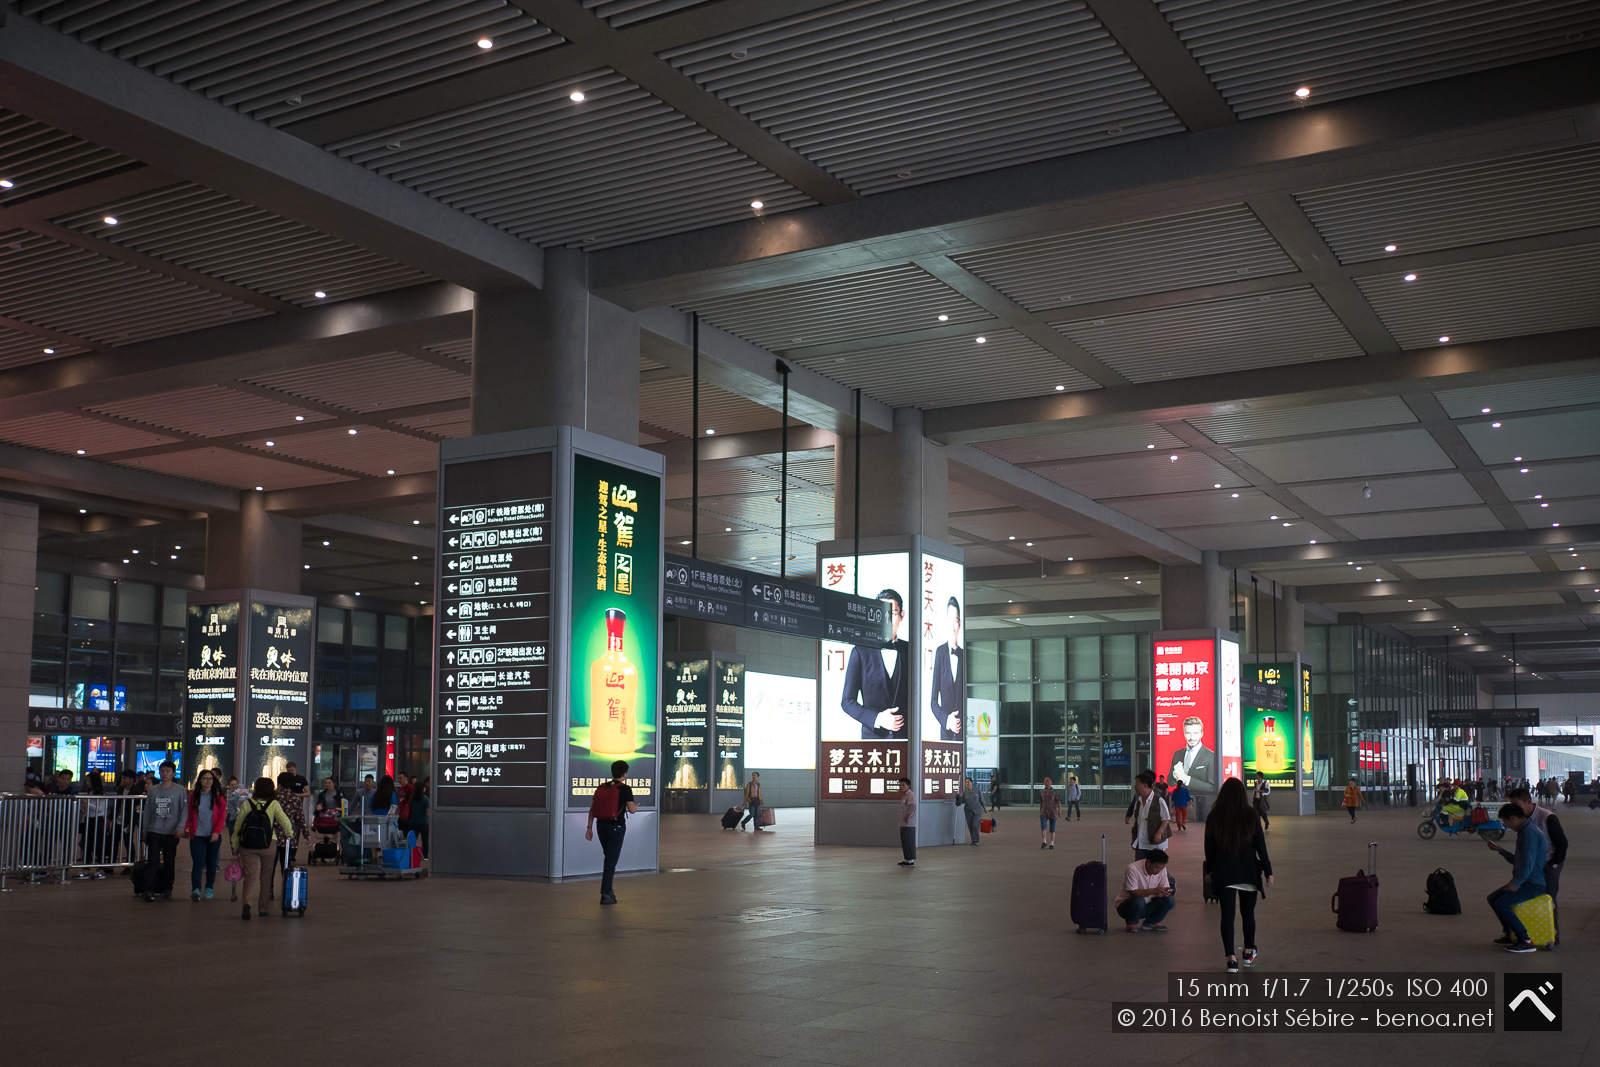 Nanjing Railway Station